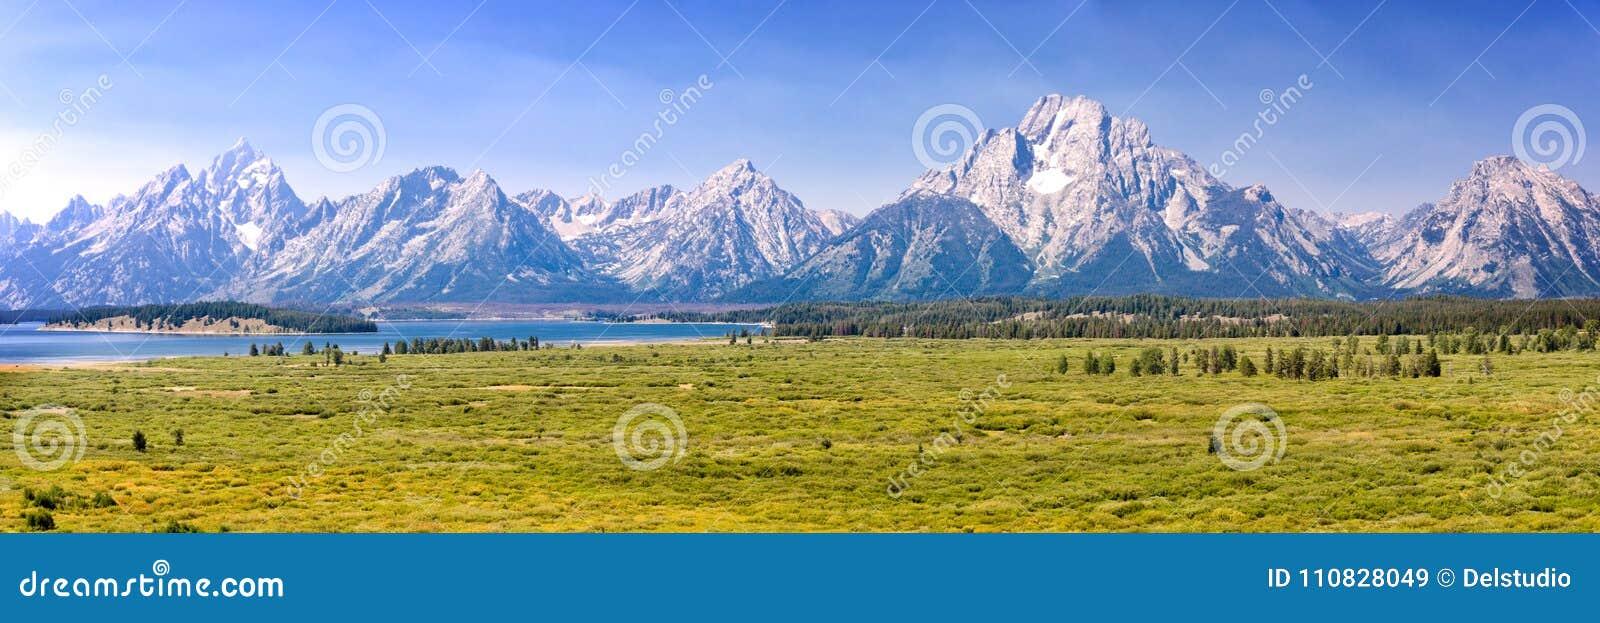 Storslagen Teton nationalpark, bergskedjapanorama, Wyoming USA